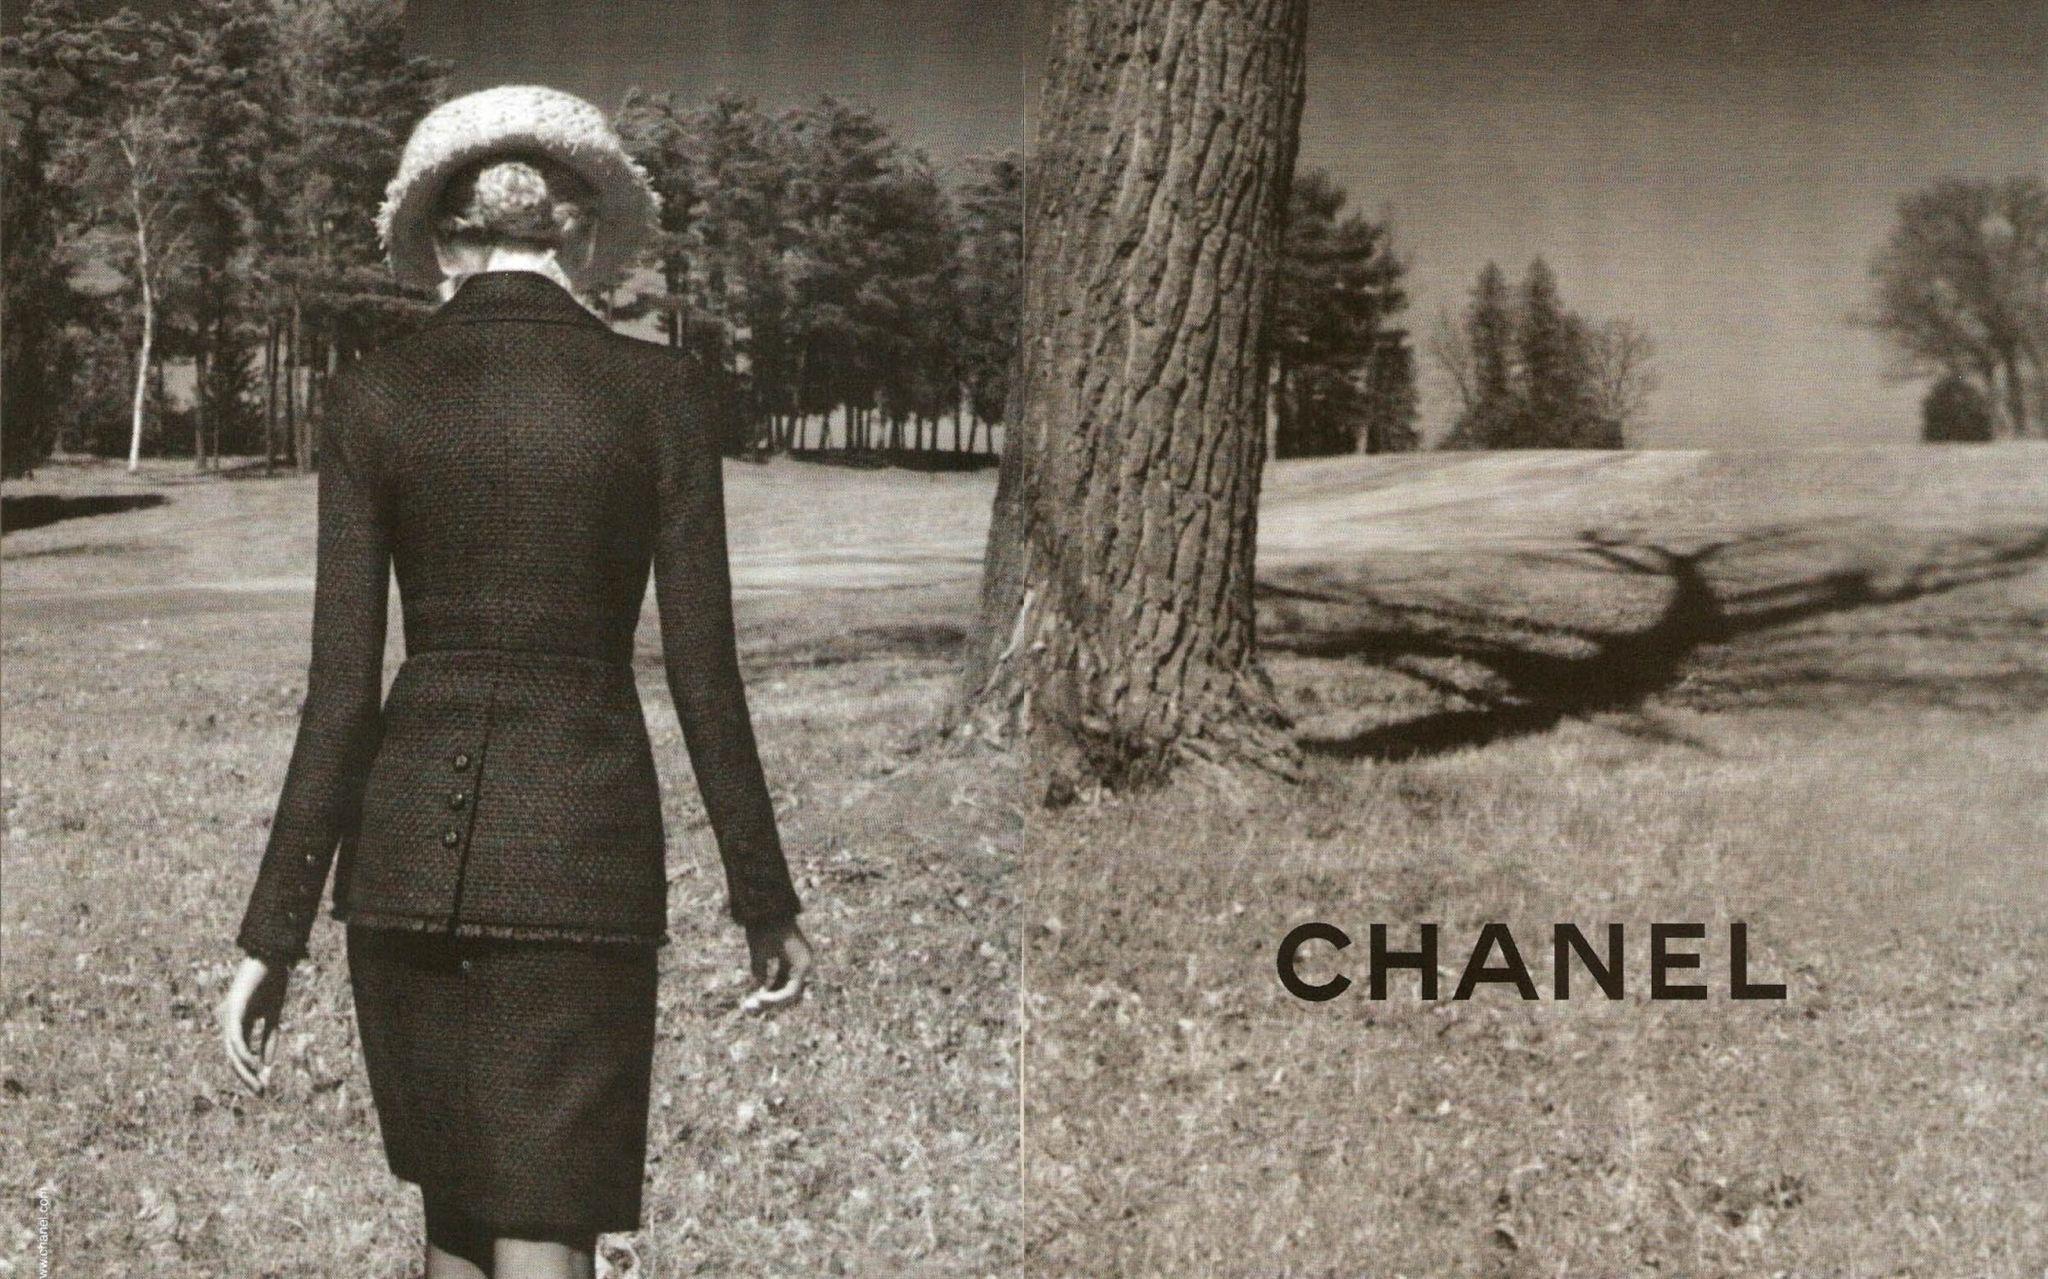 Chanel adv